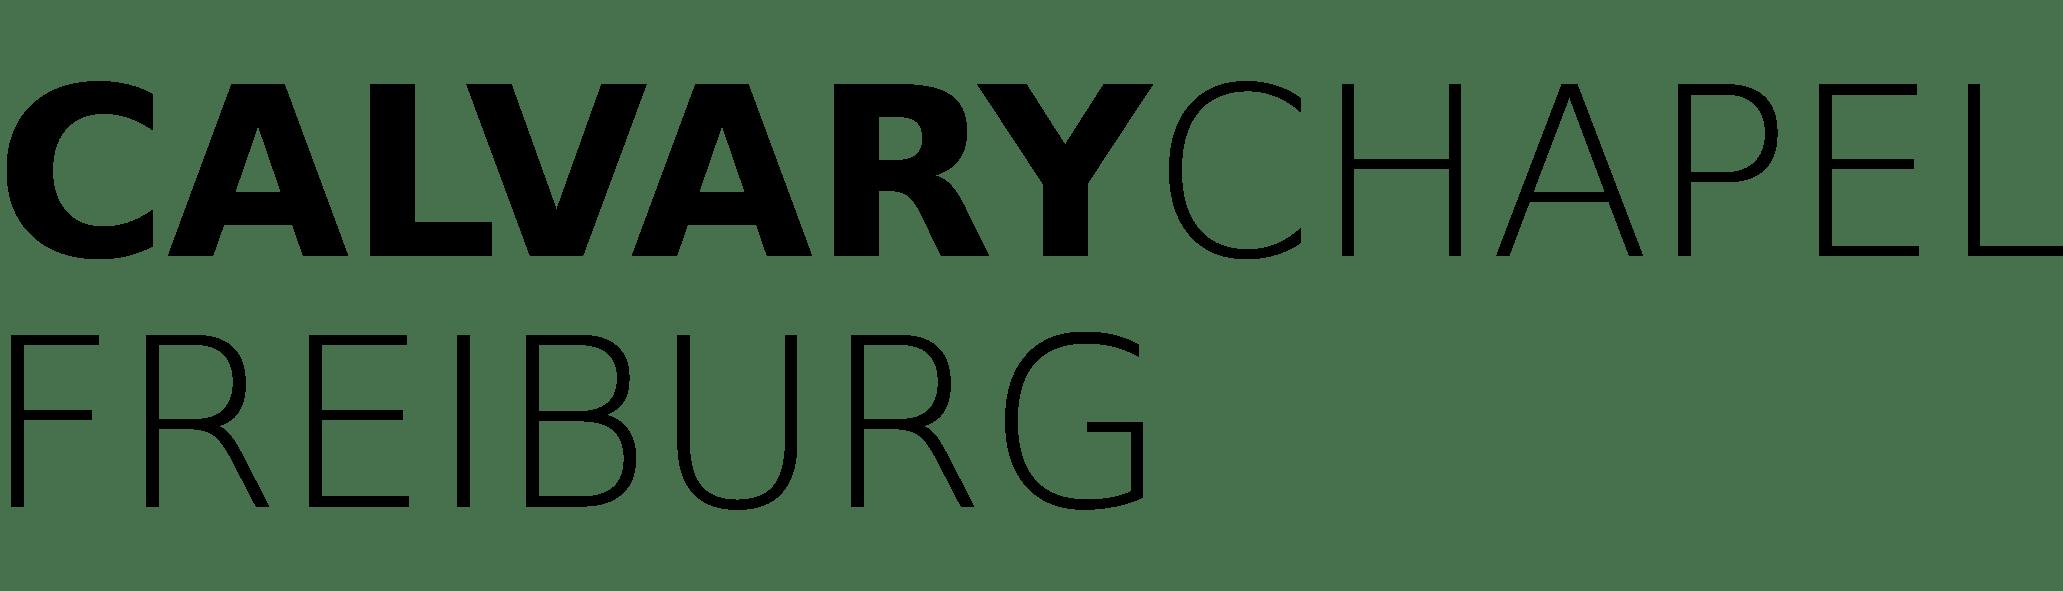 Calvary Chapel Freiburg